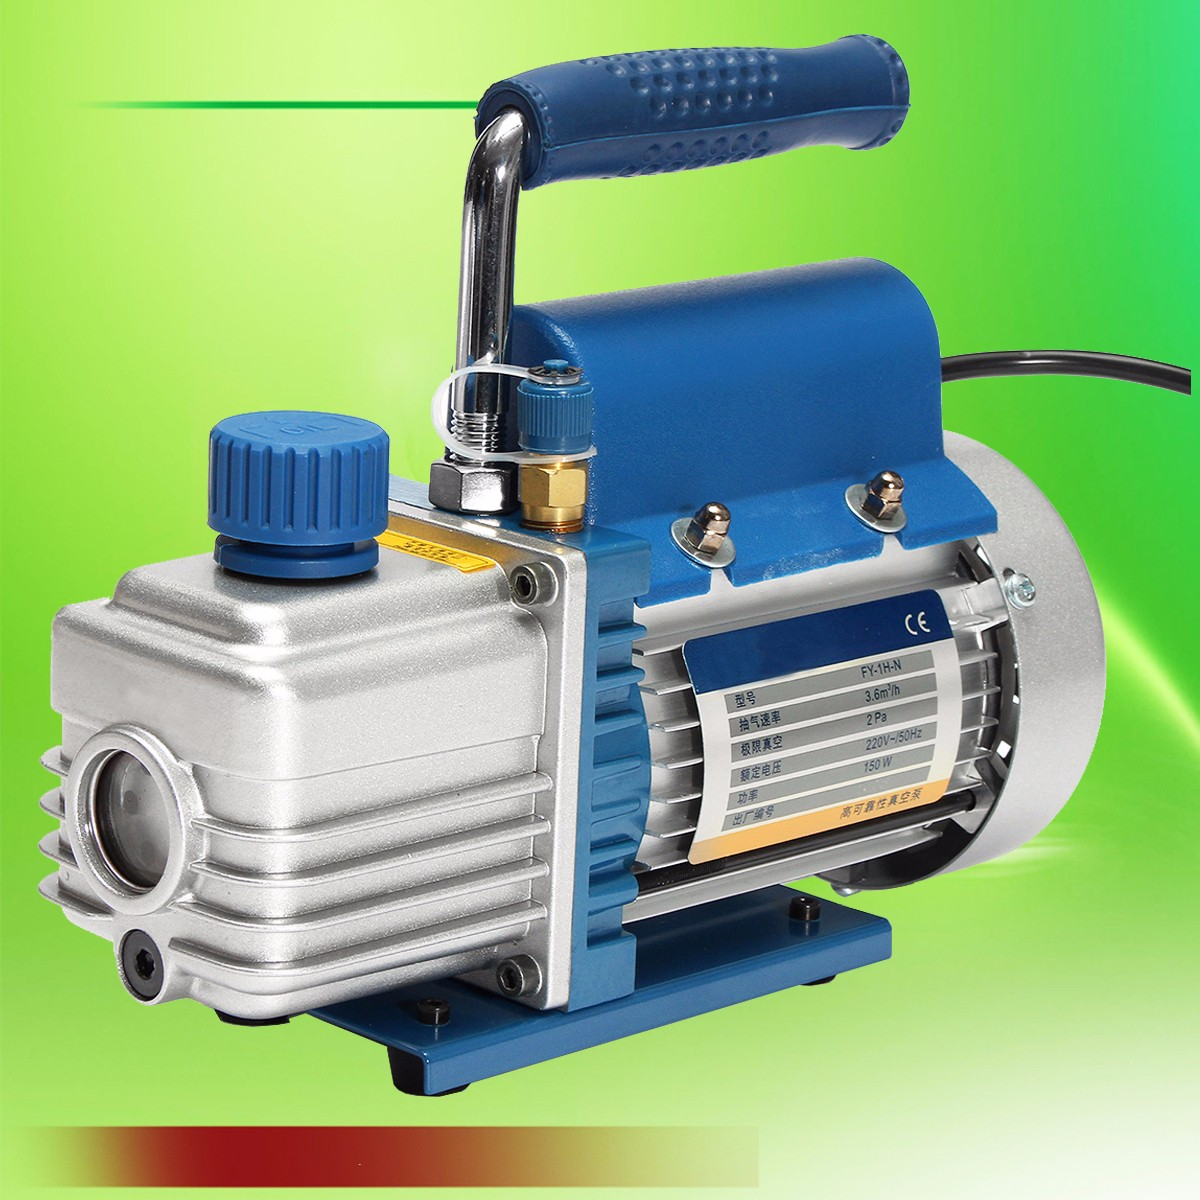 1PC 150W 220V Mini Aria Pompa Per Vuoto A Palette del Compressore D'aria Separatore LCD Macchina di Laminazione HVAC Refrigerazione strumenti di riparazione